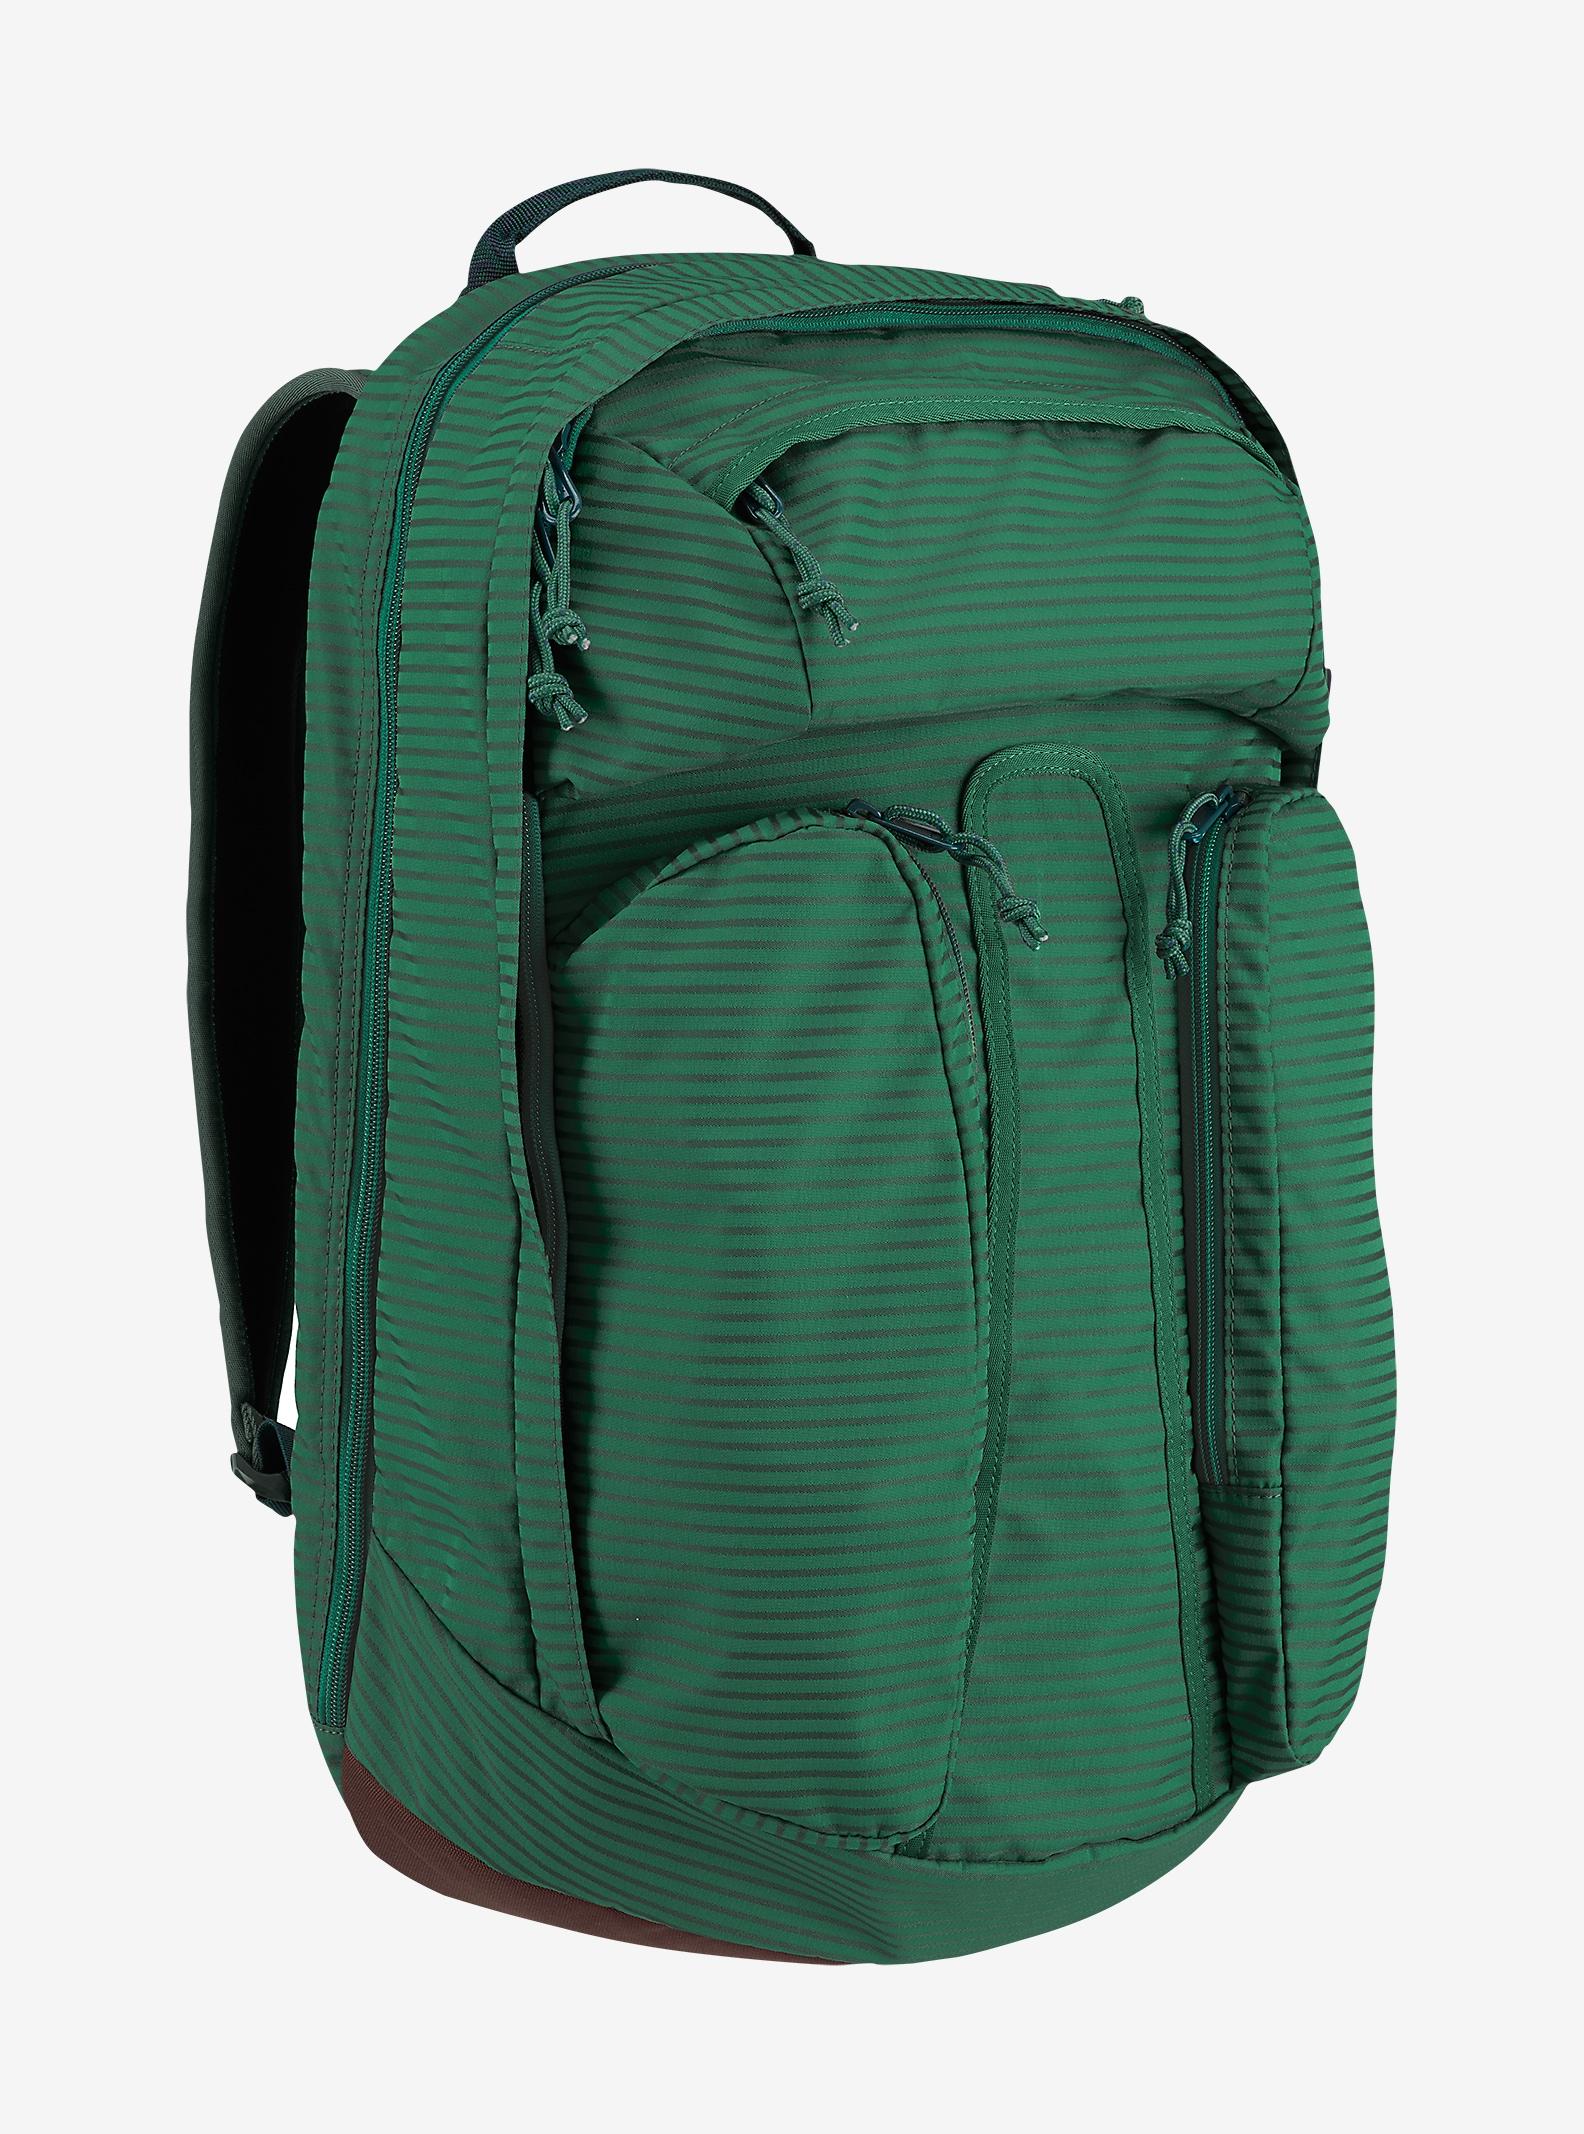 Burton Curbshark Backpack shown in Soylent Crinkle [bluesign® Approved]